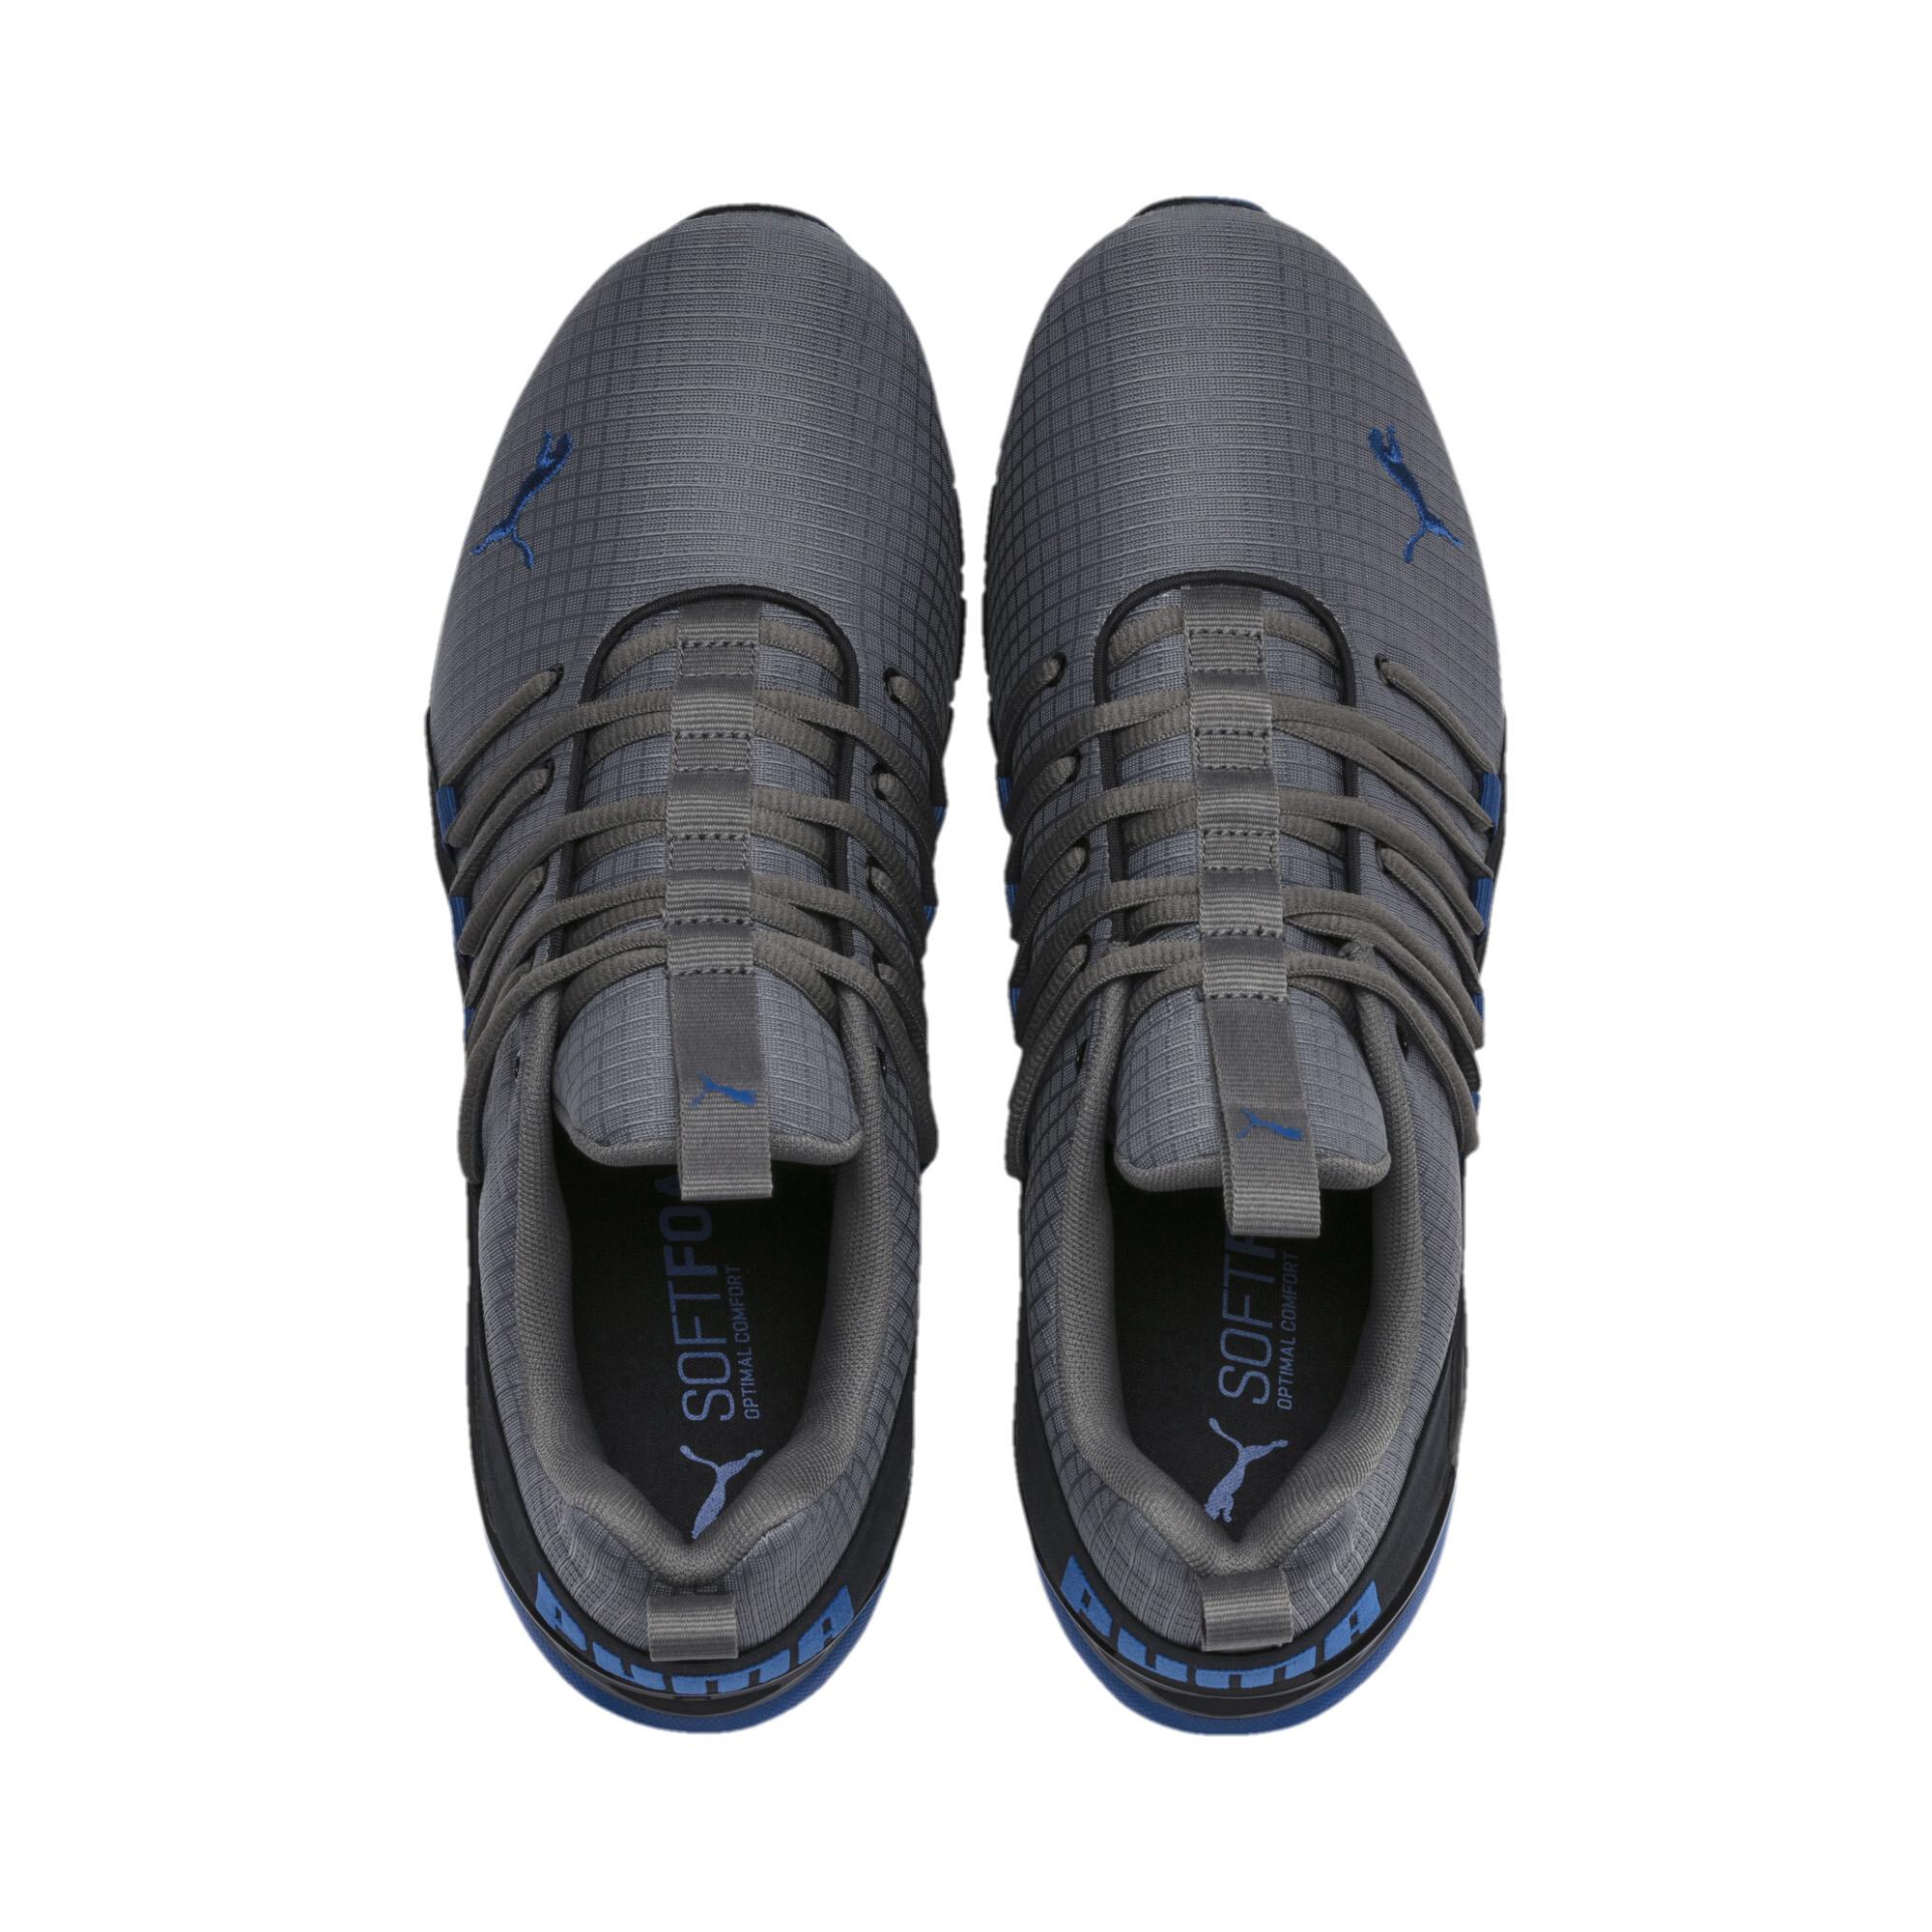 PUMA-Men-039-s-Axelion-Rip-Training-Shoes thumbnail 22